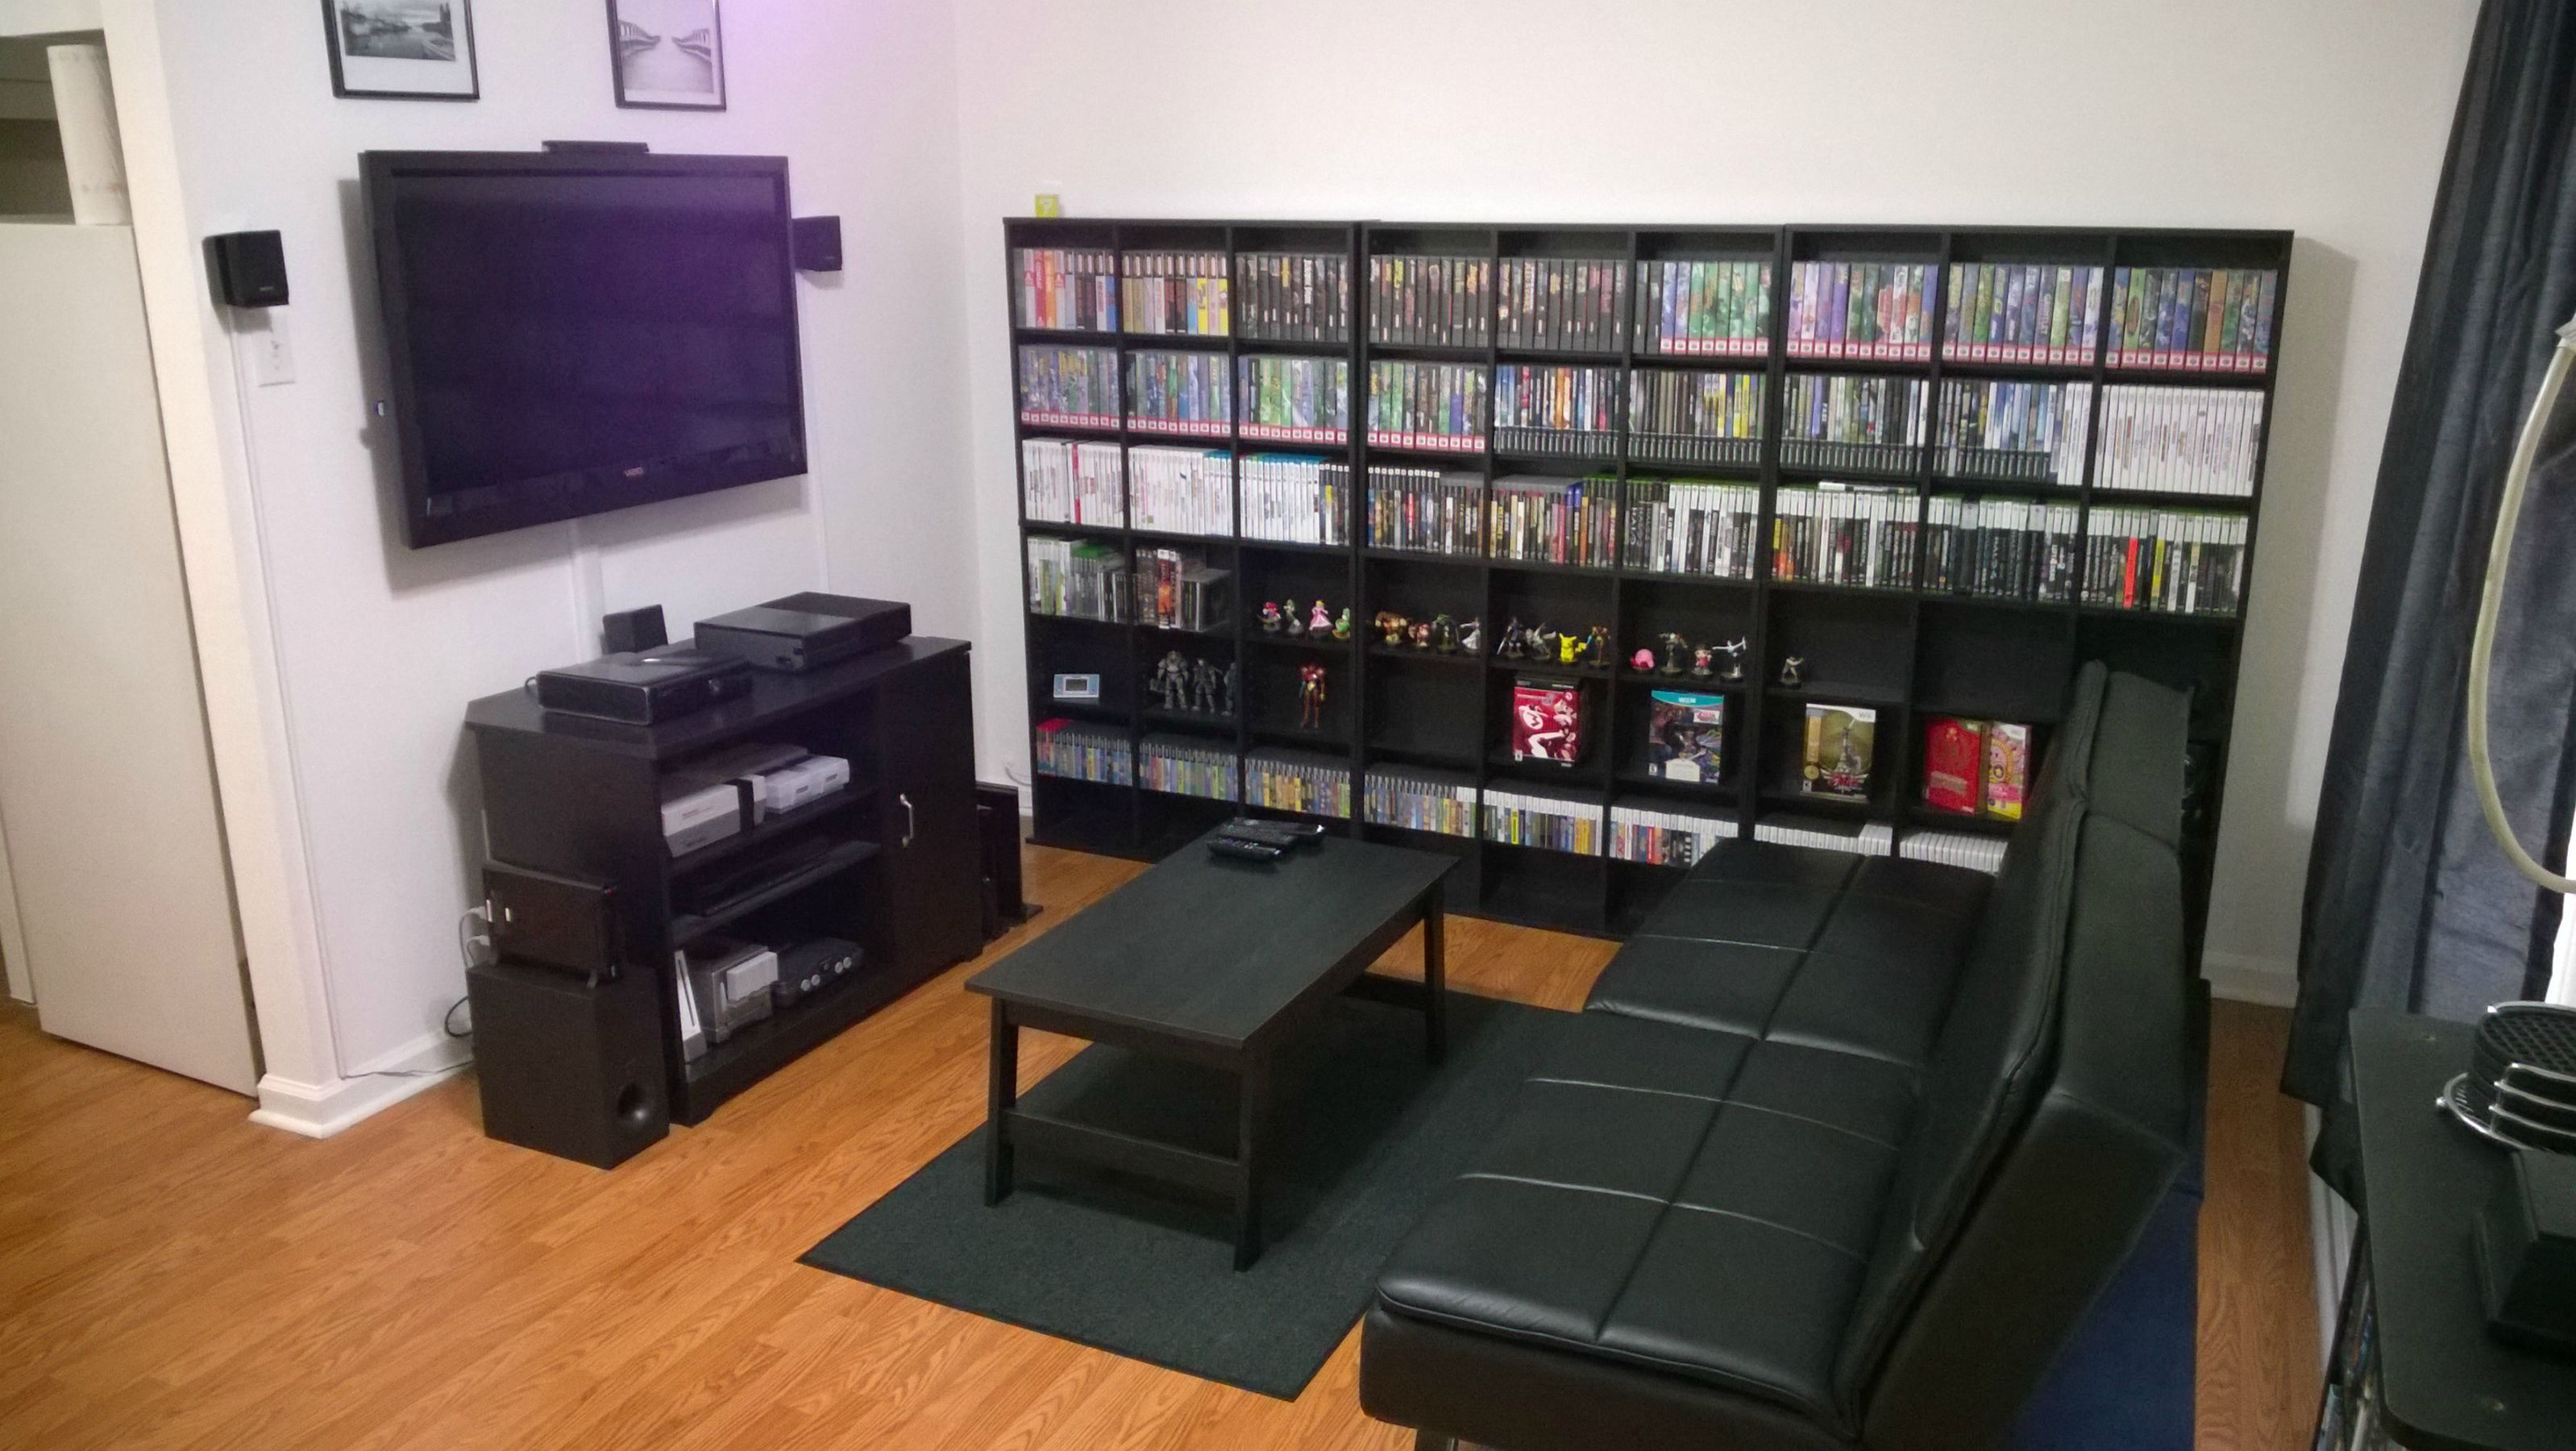 My Gaming Living Room 1 7 15 Imgur Living Room Setup Video Game Rooms Gamer Room